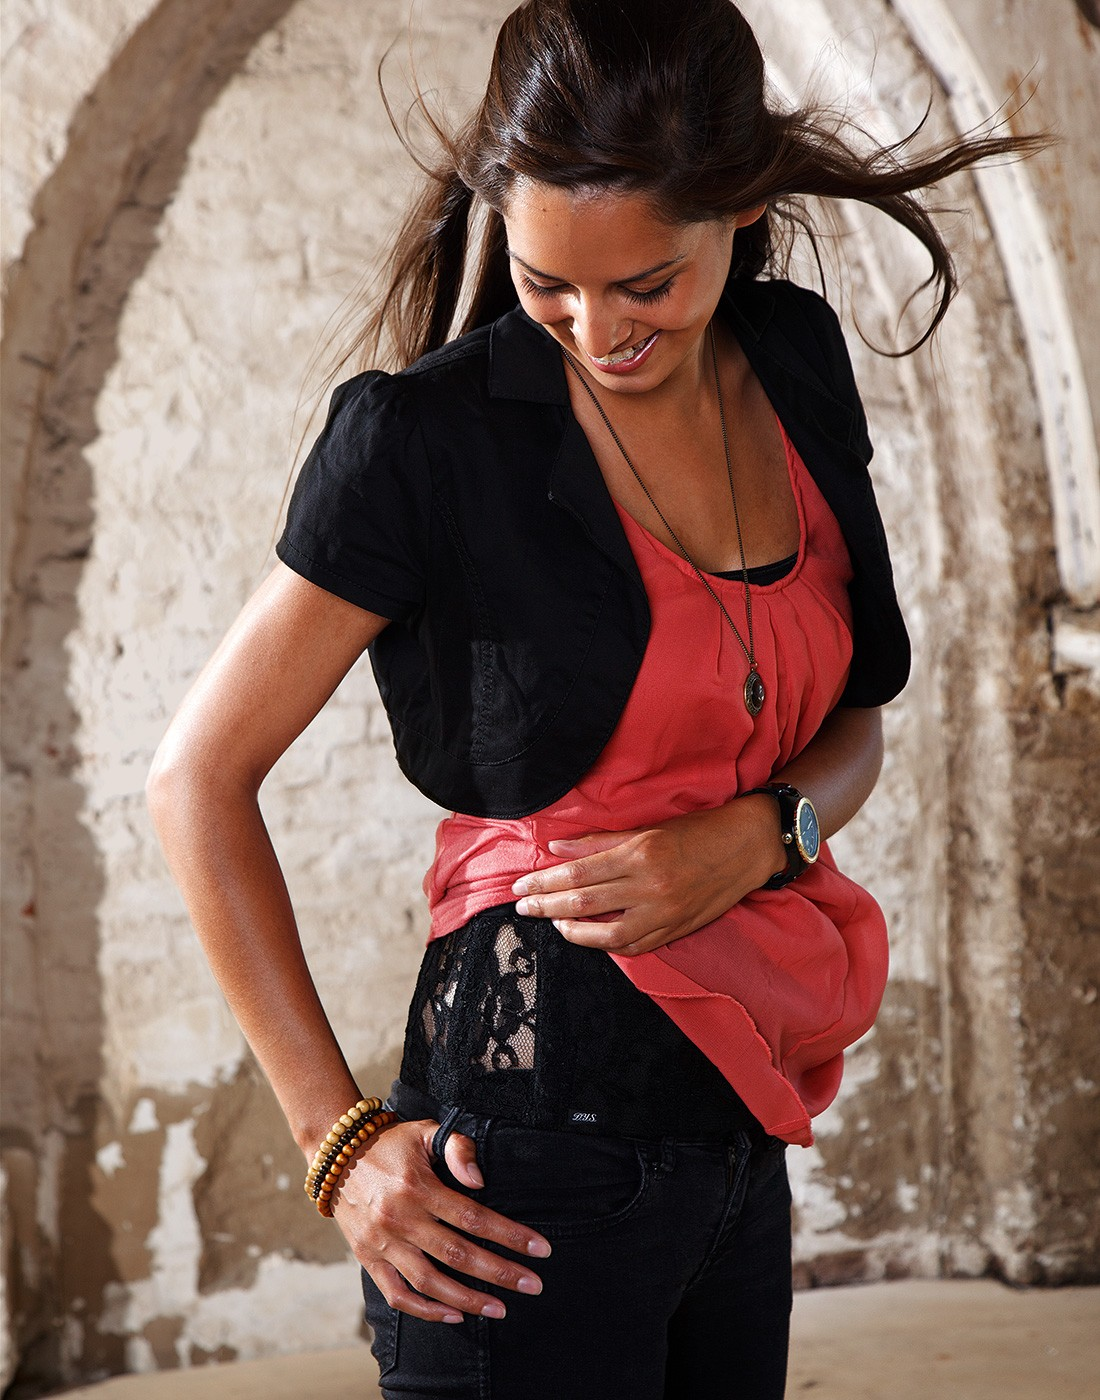 cb8d51864a7 Perfecte match: stoma & kleding - MediReva